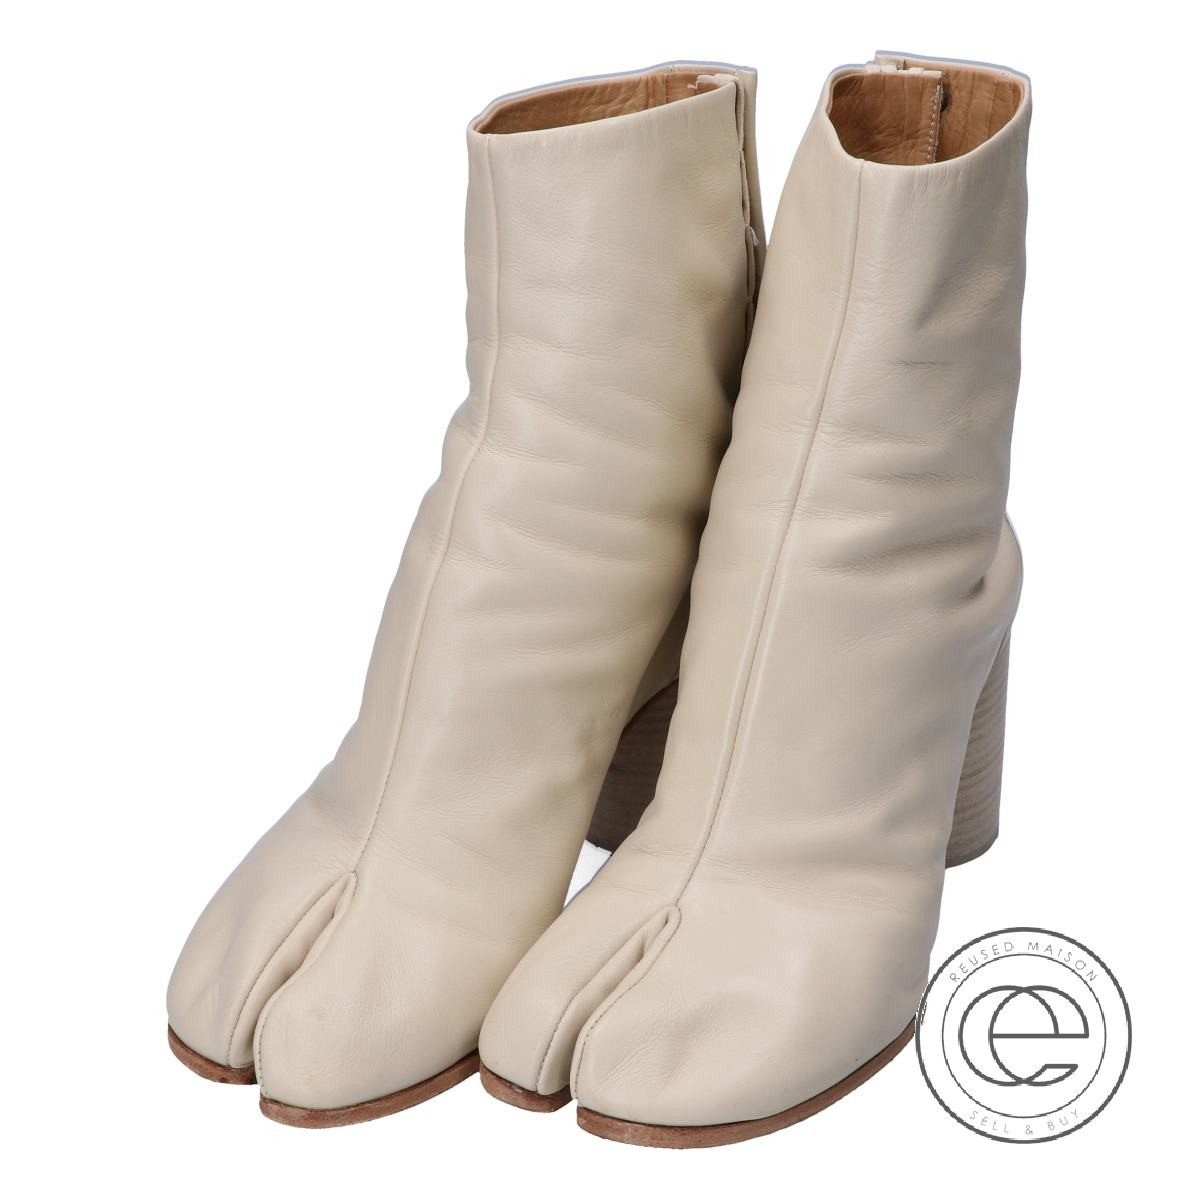 e12a12578e3d MAISON MARGIELA メゾンマルジェラ 22 17AW S58WU0136 TABI BOOTS レザー 足袋ブーツ 38 アイボリー  レディース【